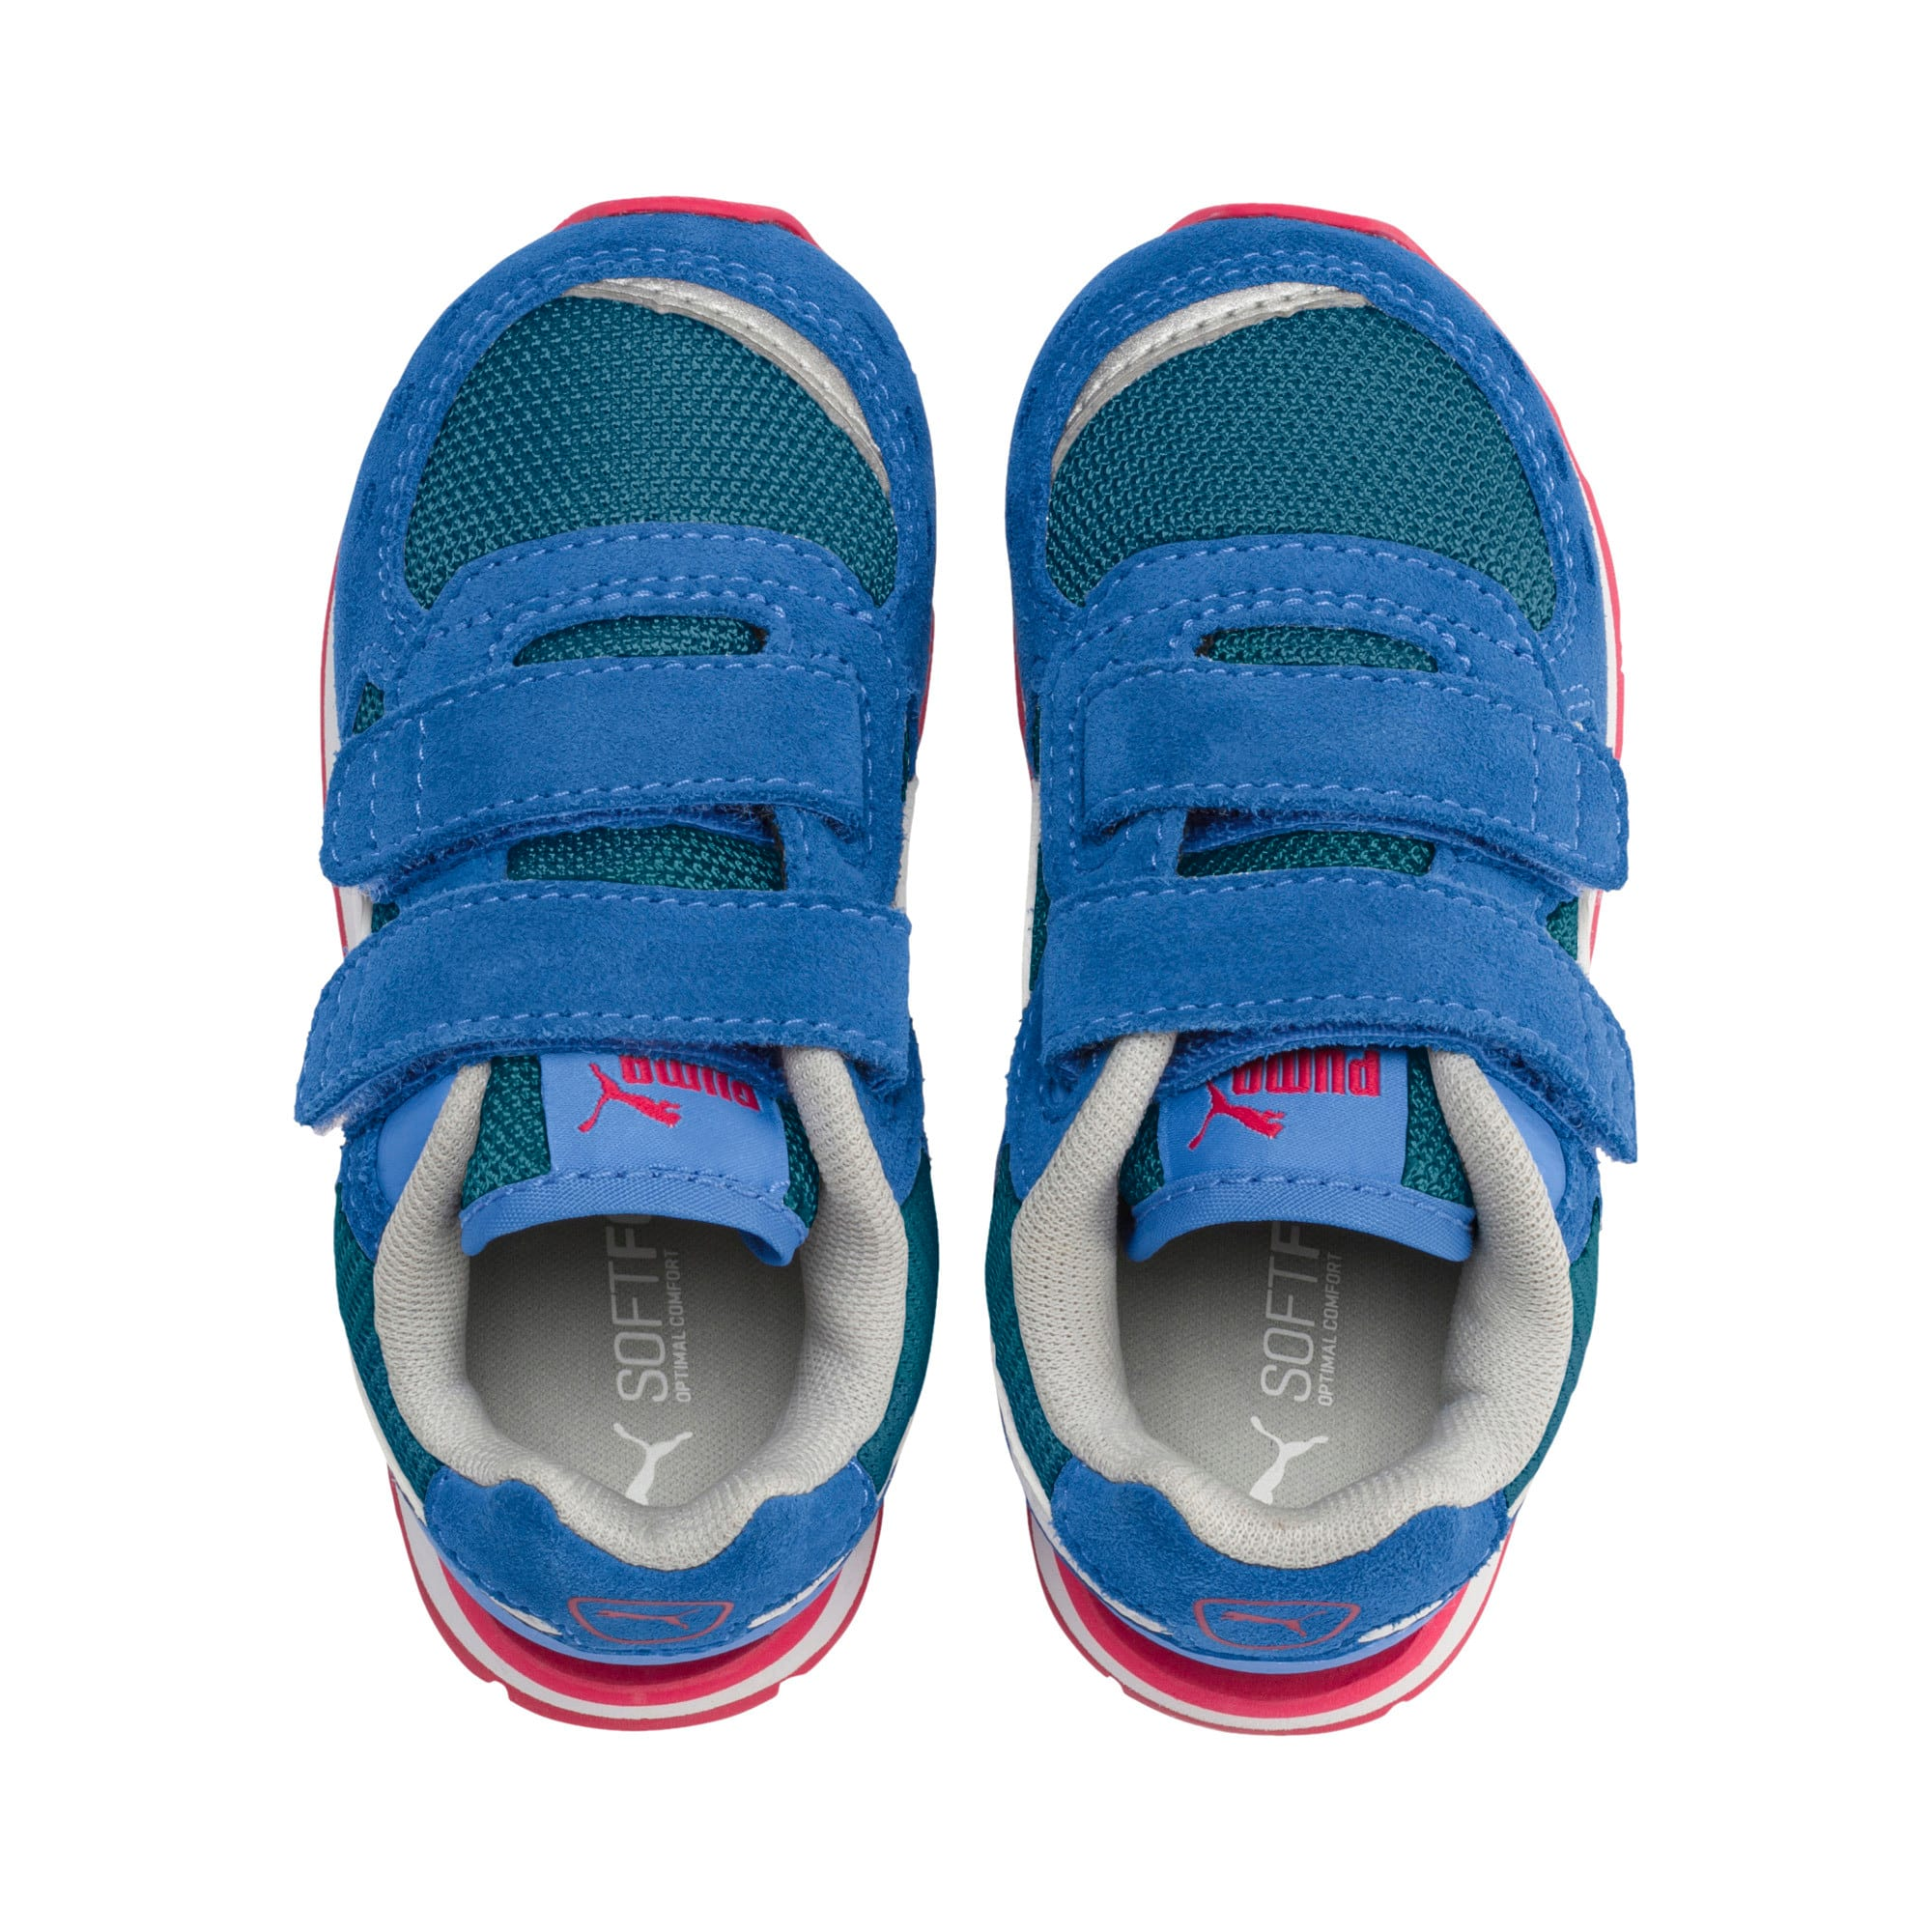 Thumbnail 6 of Vista Toddler Shoes, Ultramarine-Puma White, medium